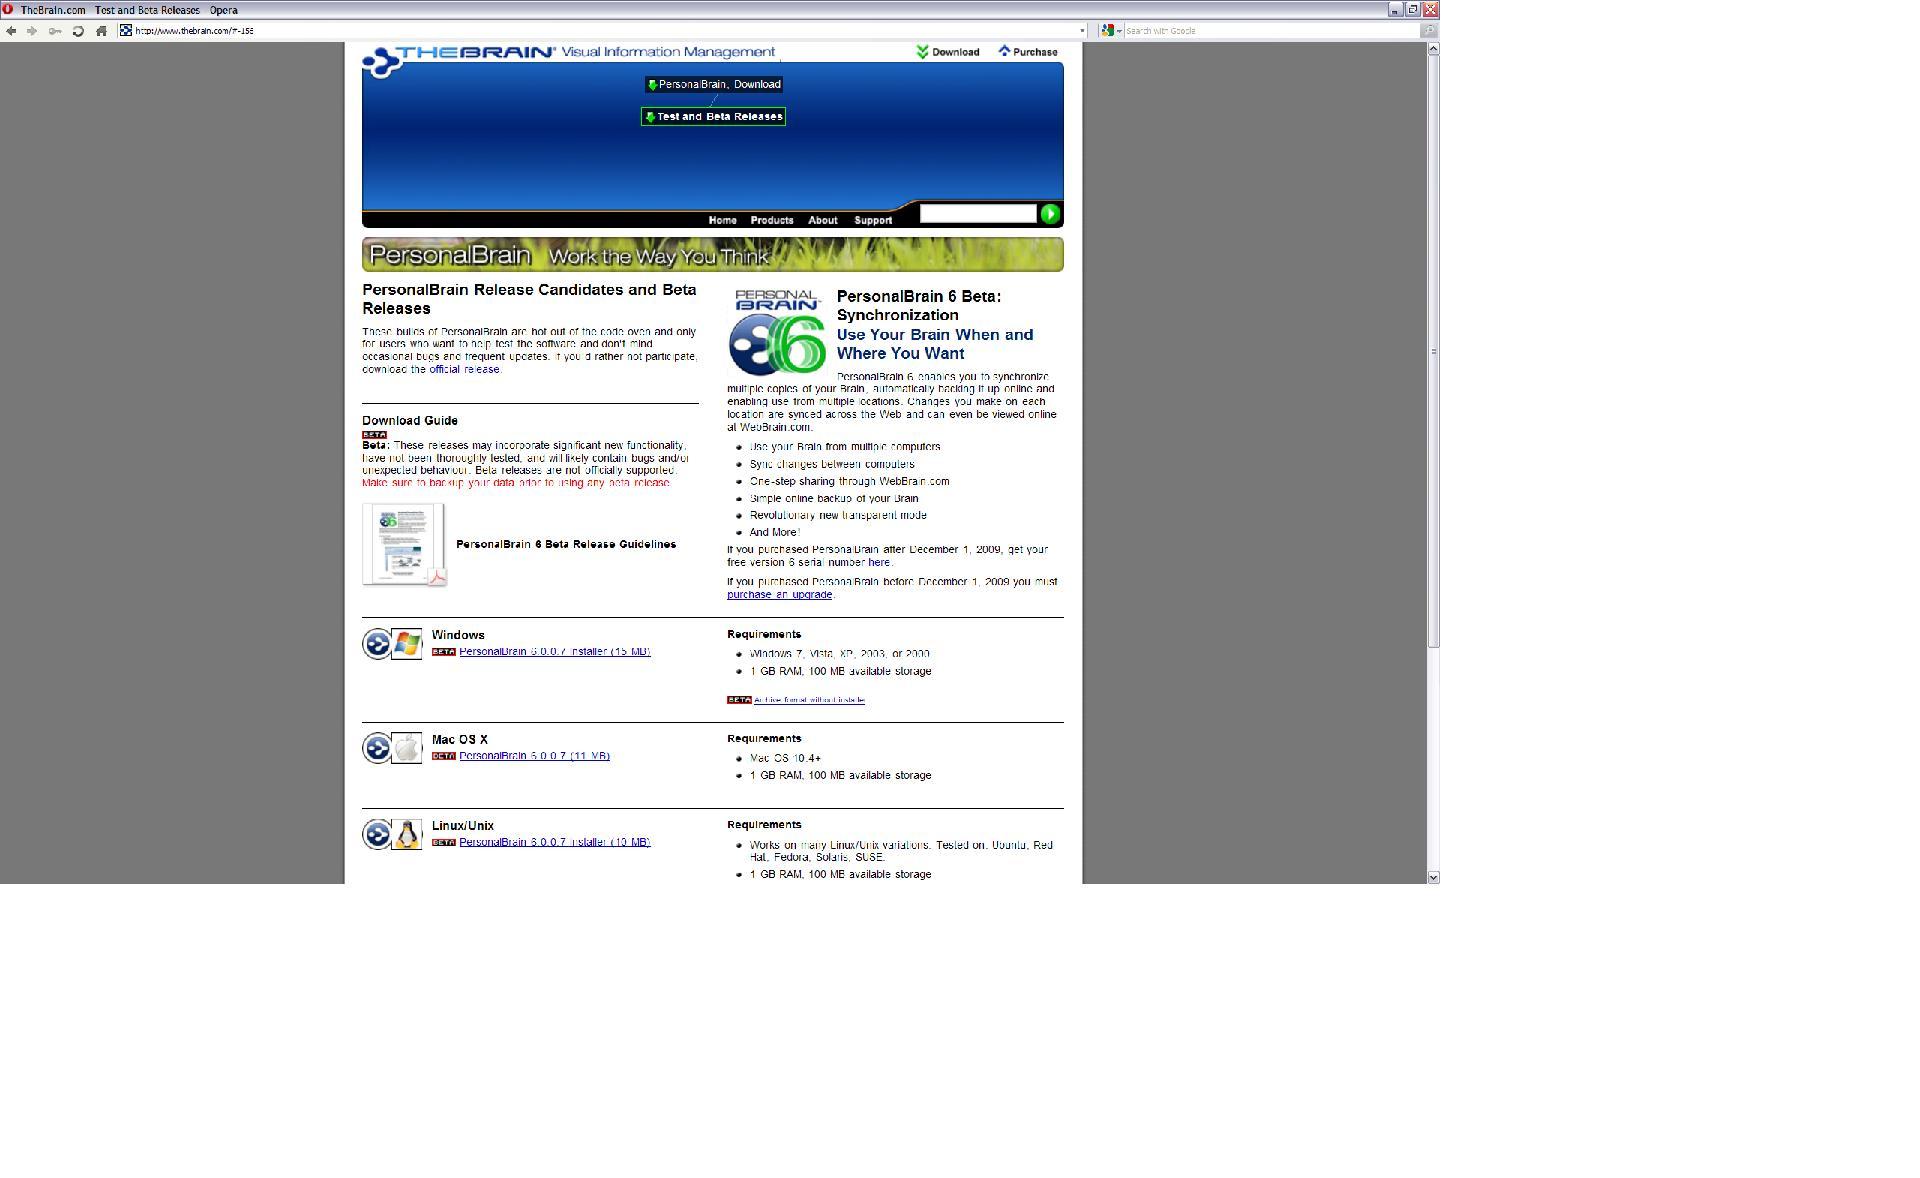 Click image for larger version - Name: thebrain_website.JPG, Views: 94, Size: 159.63 KB